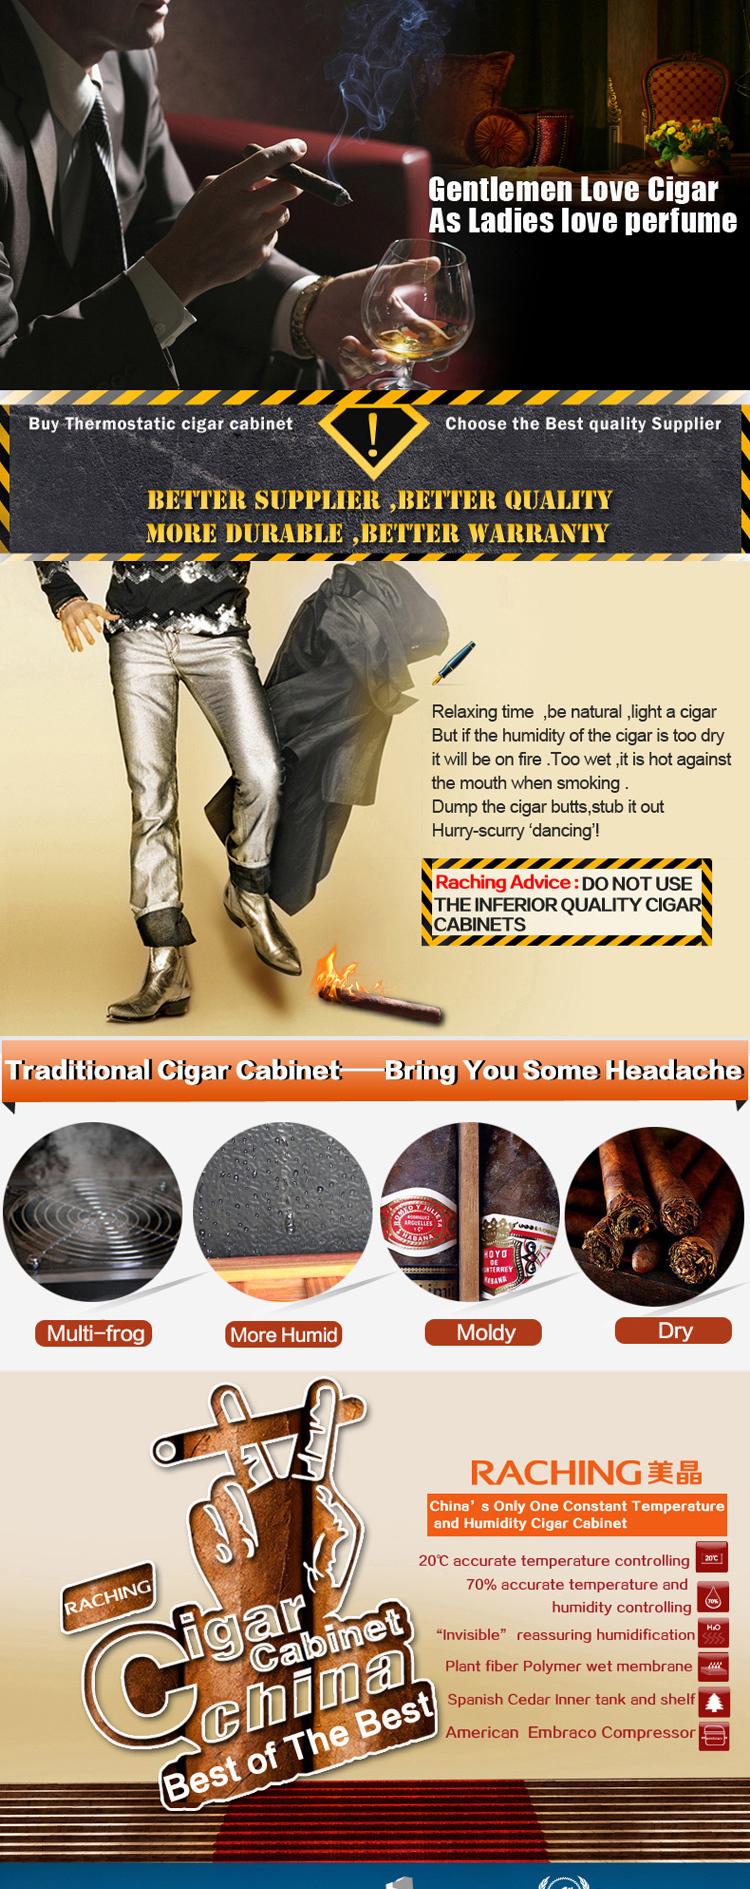 Chinese Cedar Sleeve Cigar Humidors For Sale Used Humidor Cabinet ...